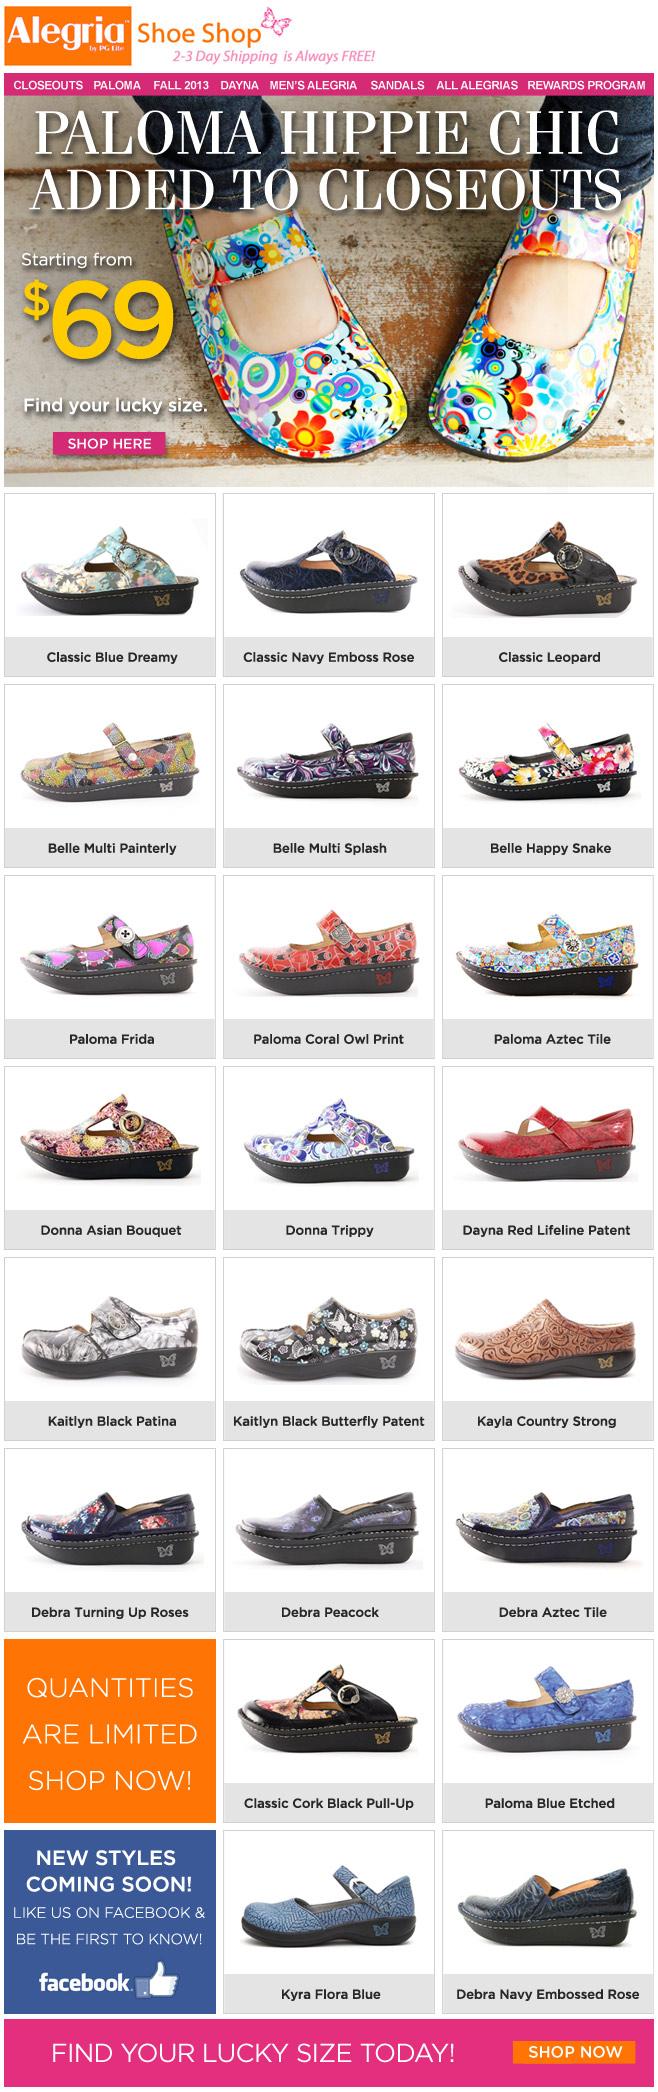 Alegria shoes, Nursing shoes, Nursing